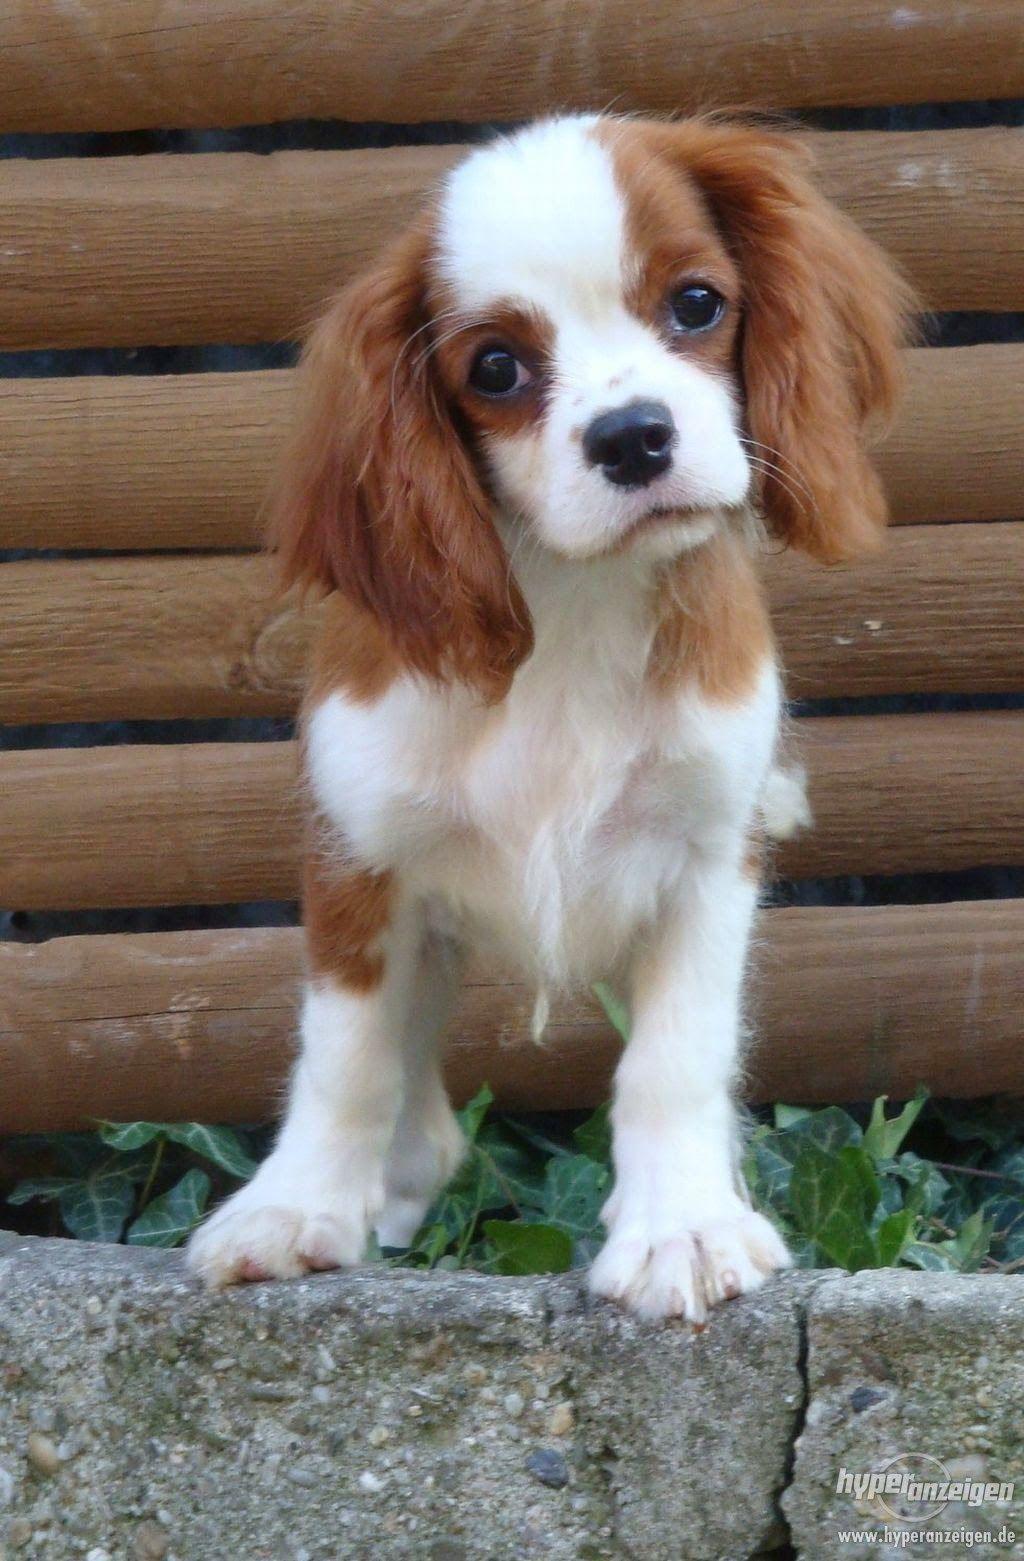 Top 5 Family Friendly Dog Breeds Dog Breeds Friendly Dog Breeds